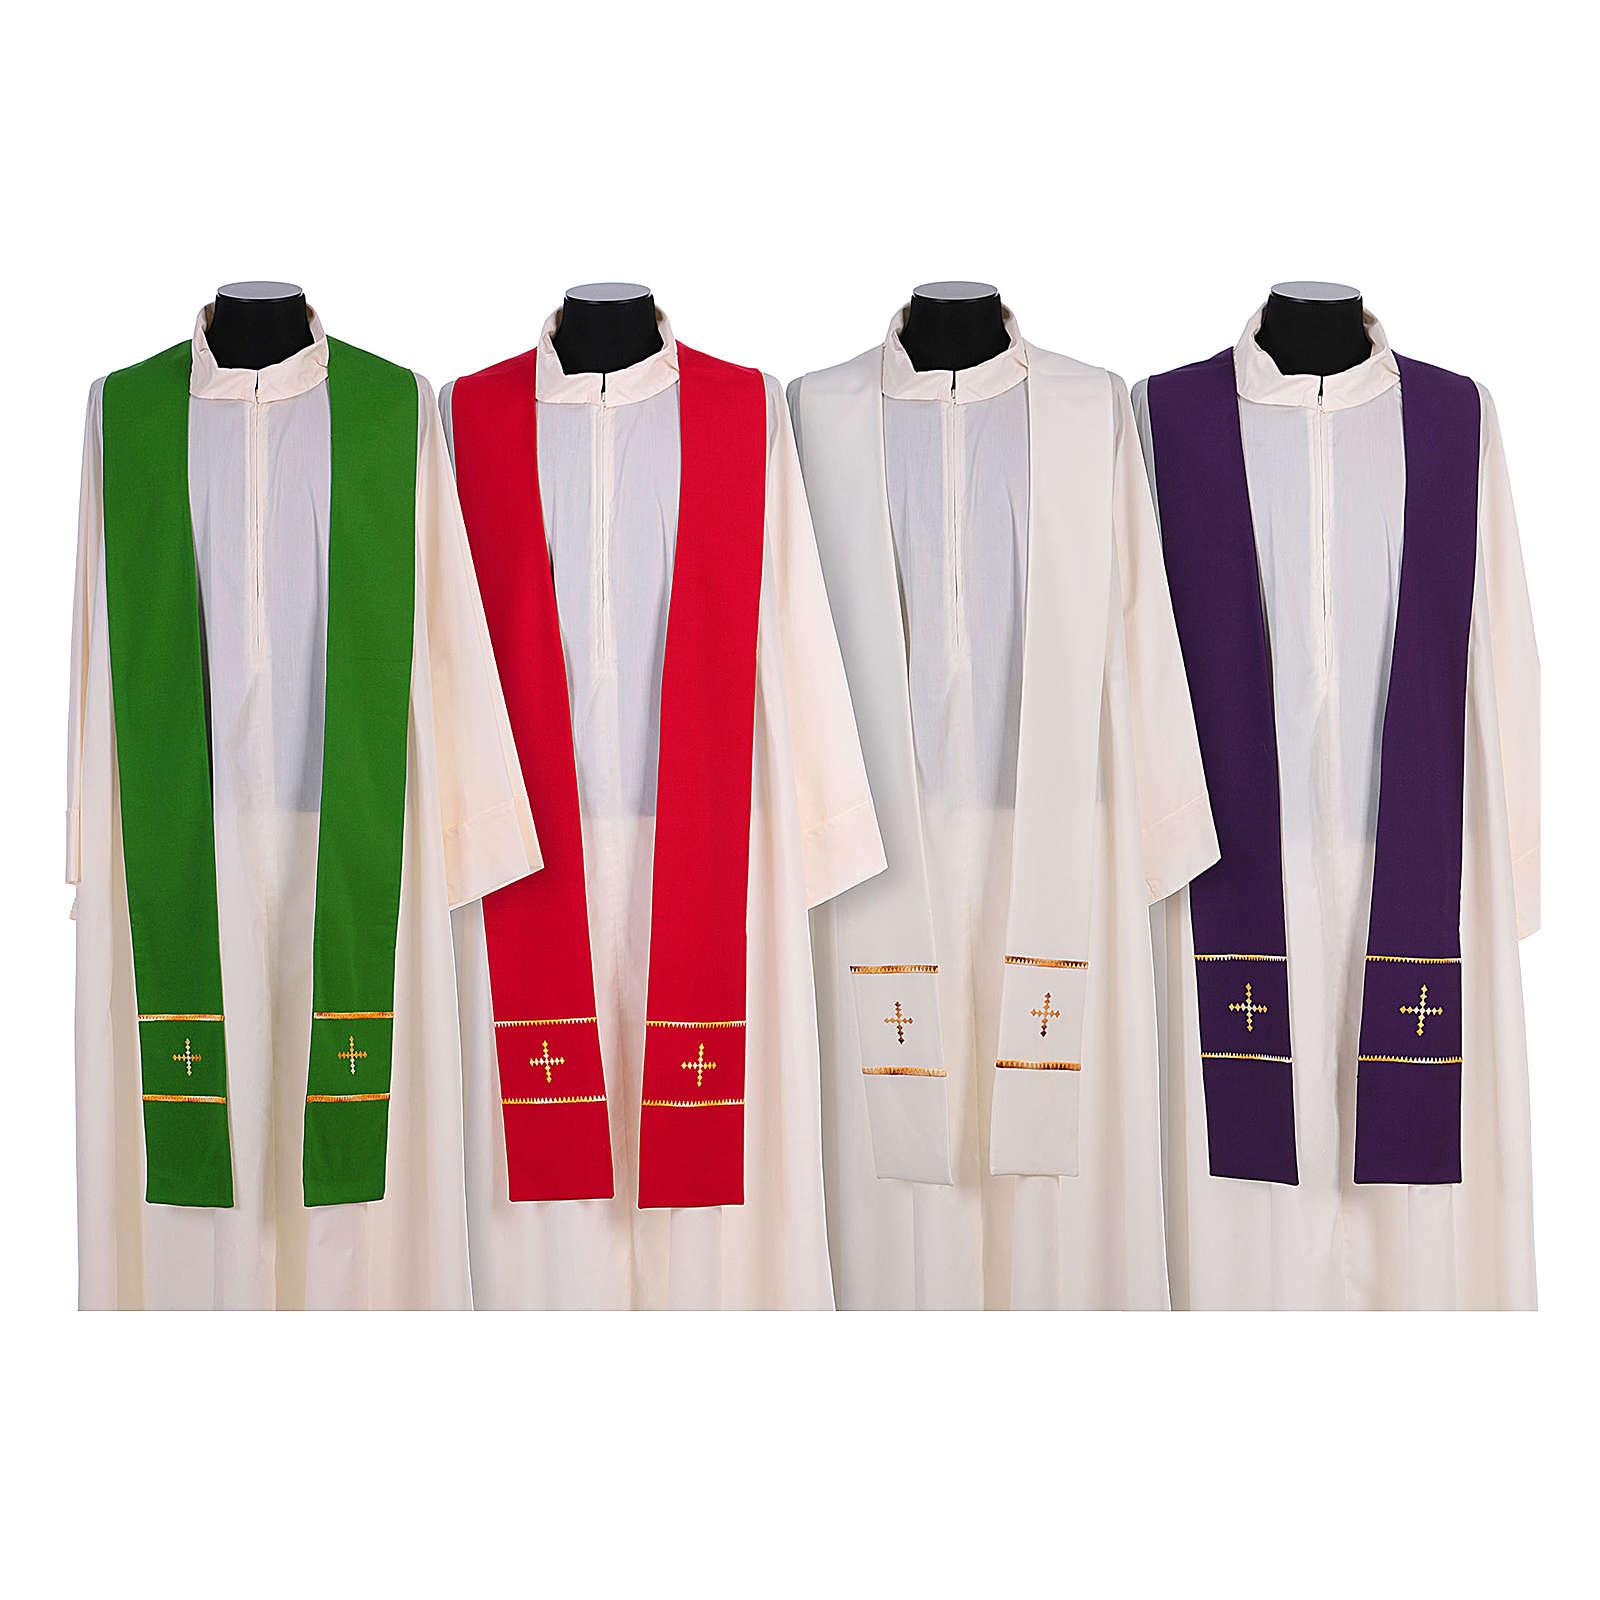 Stola ricamata a mano pura lana 4 colori - Monastero Montesole 4